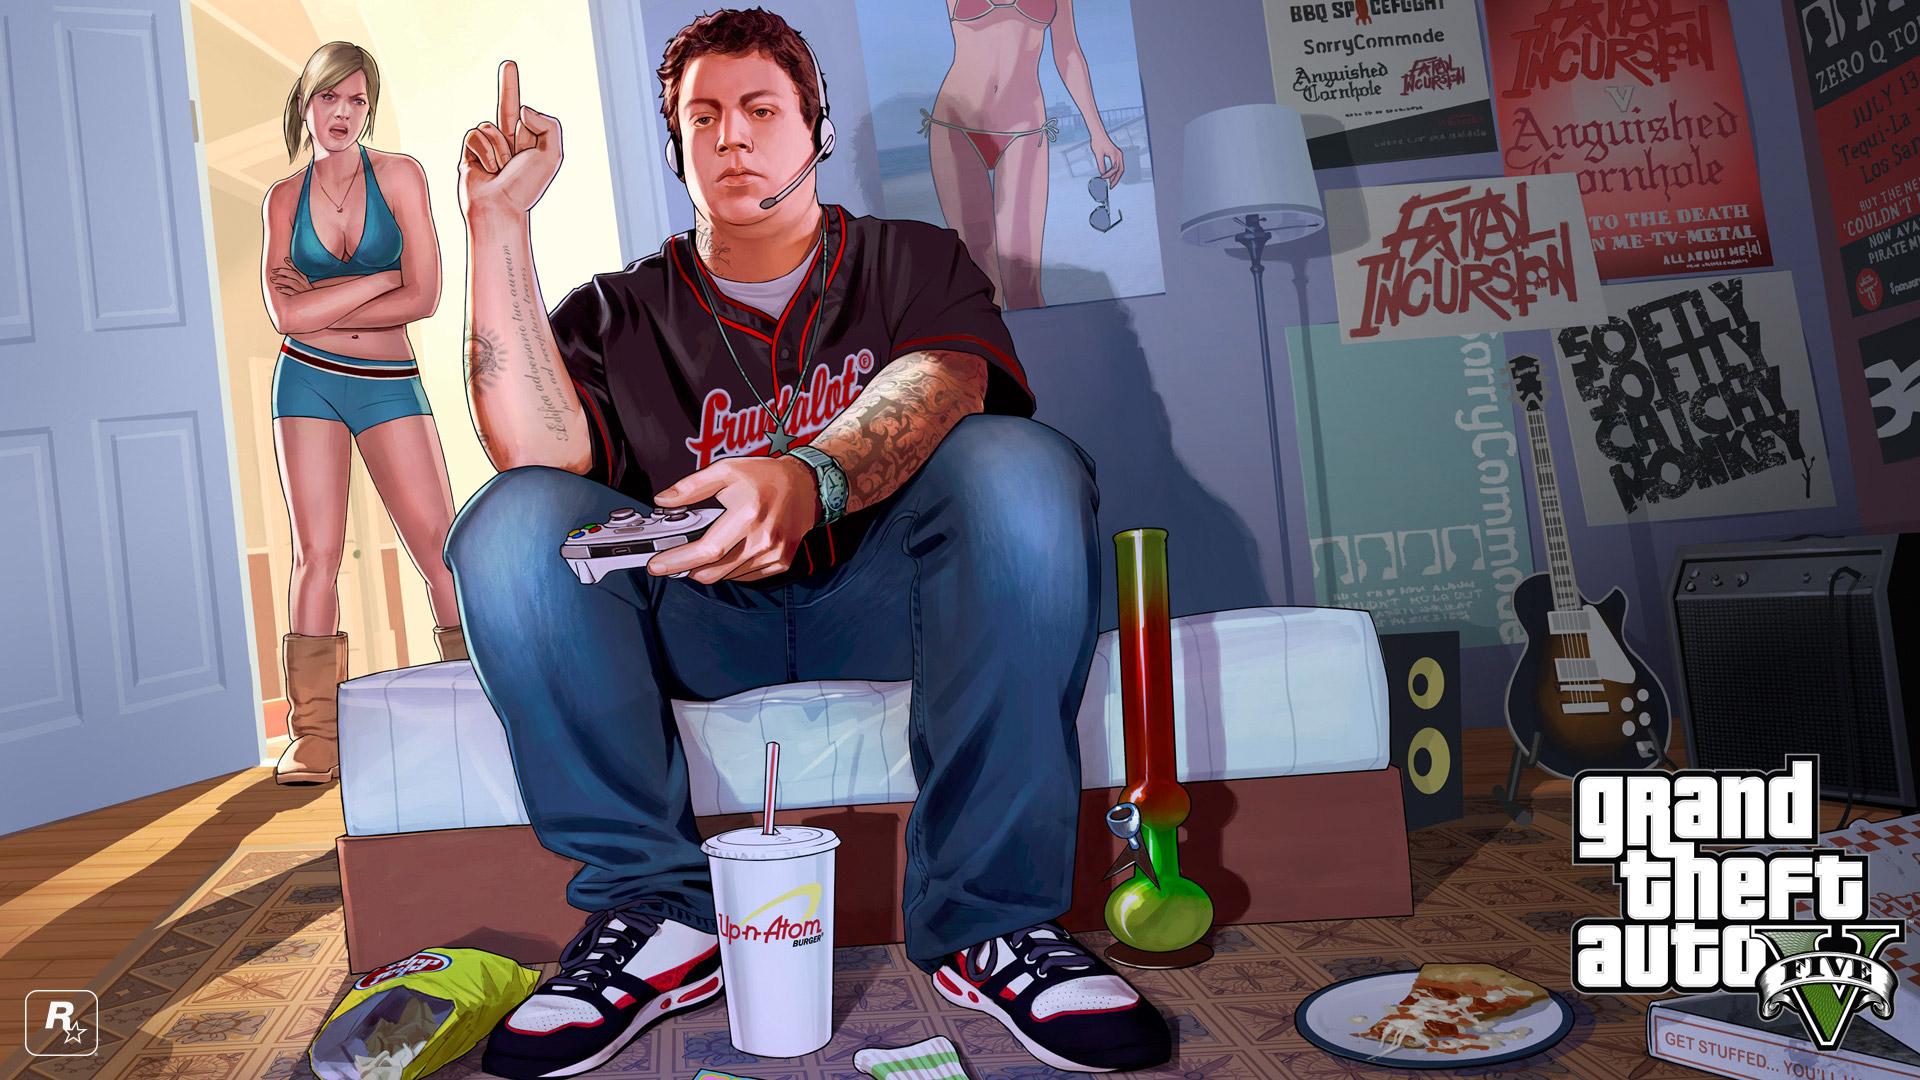 Grand Theft Auto 5 wallpaper 18